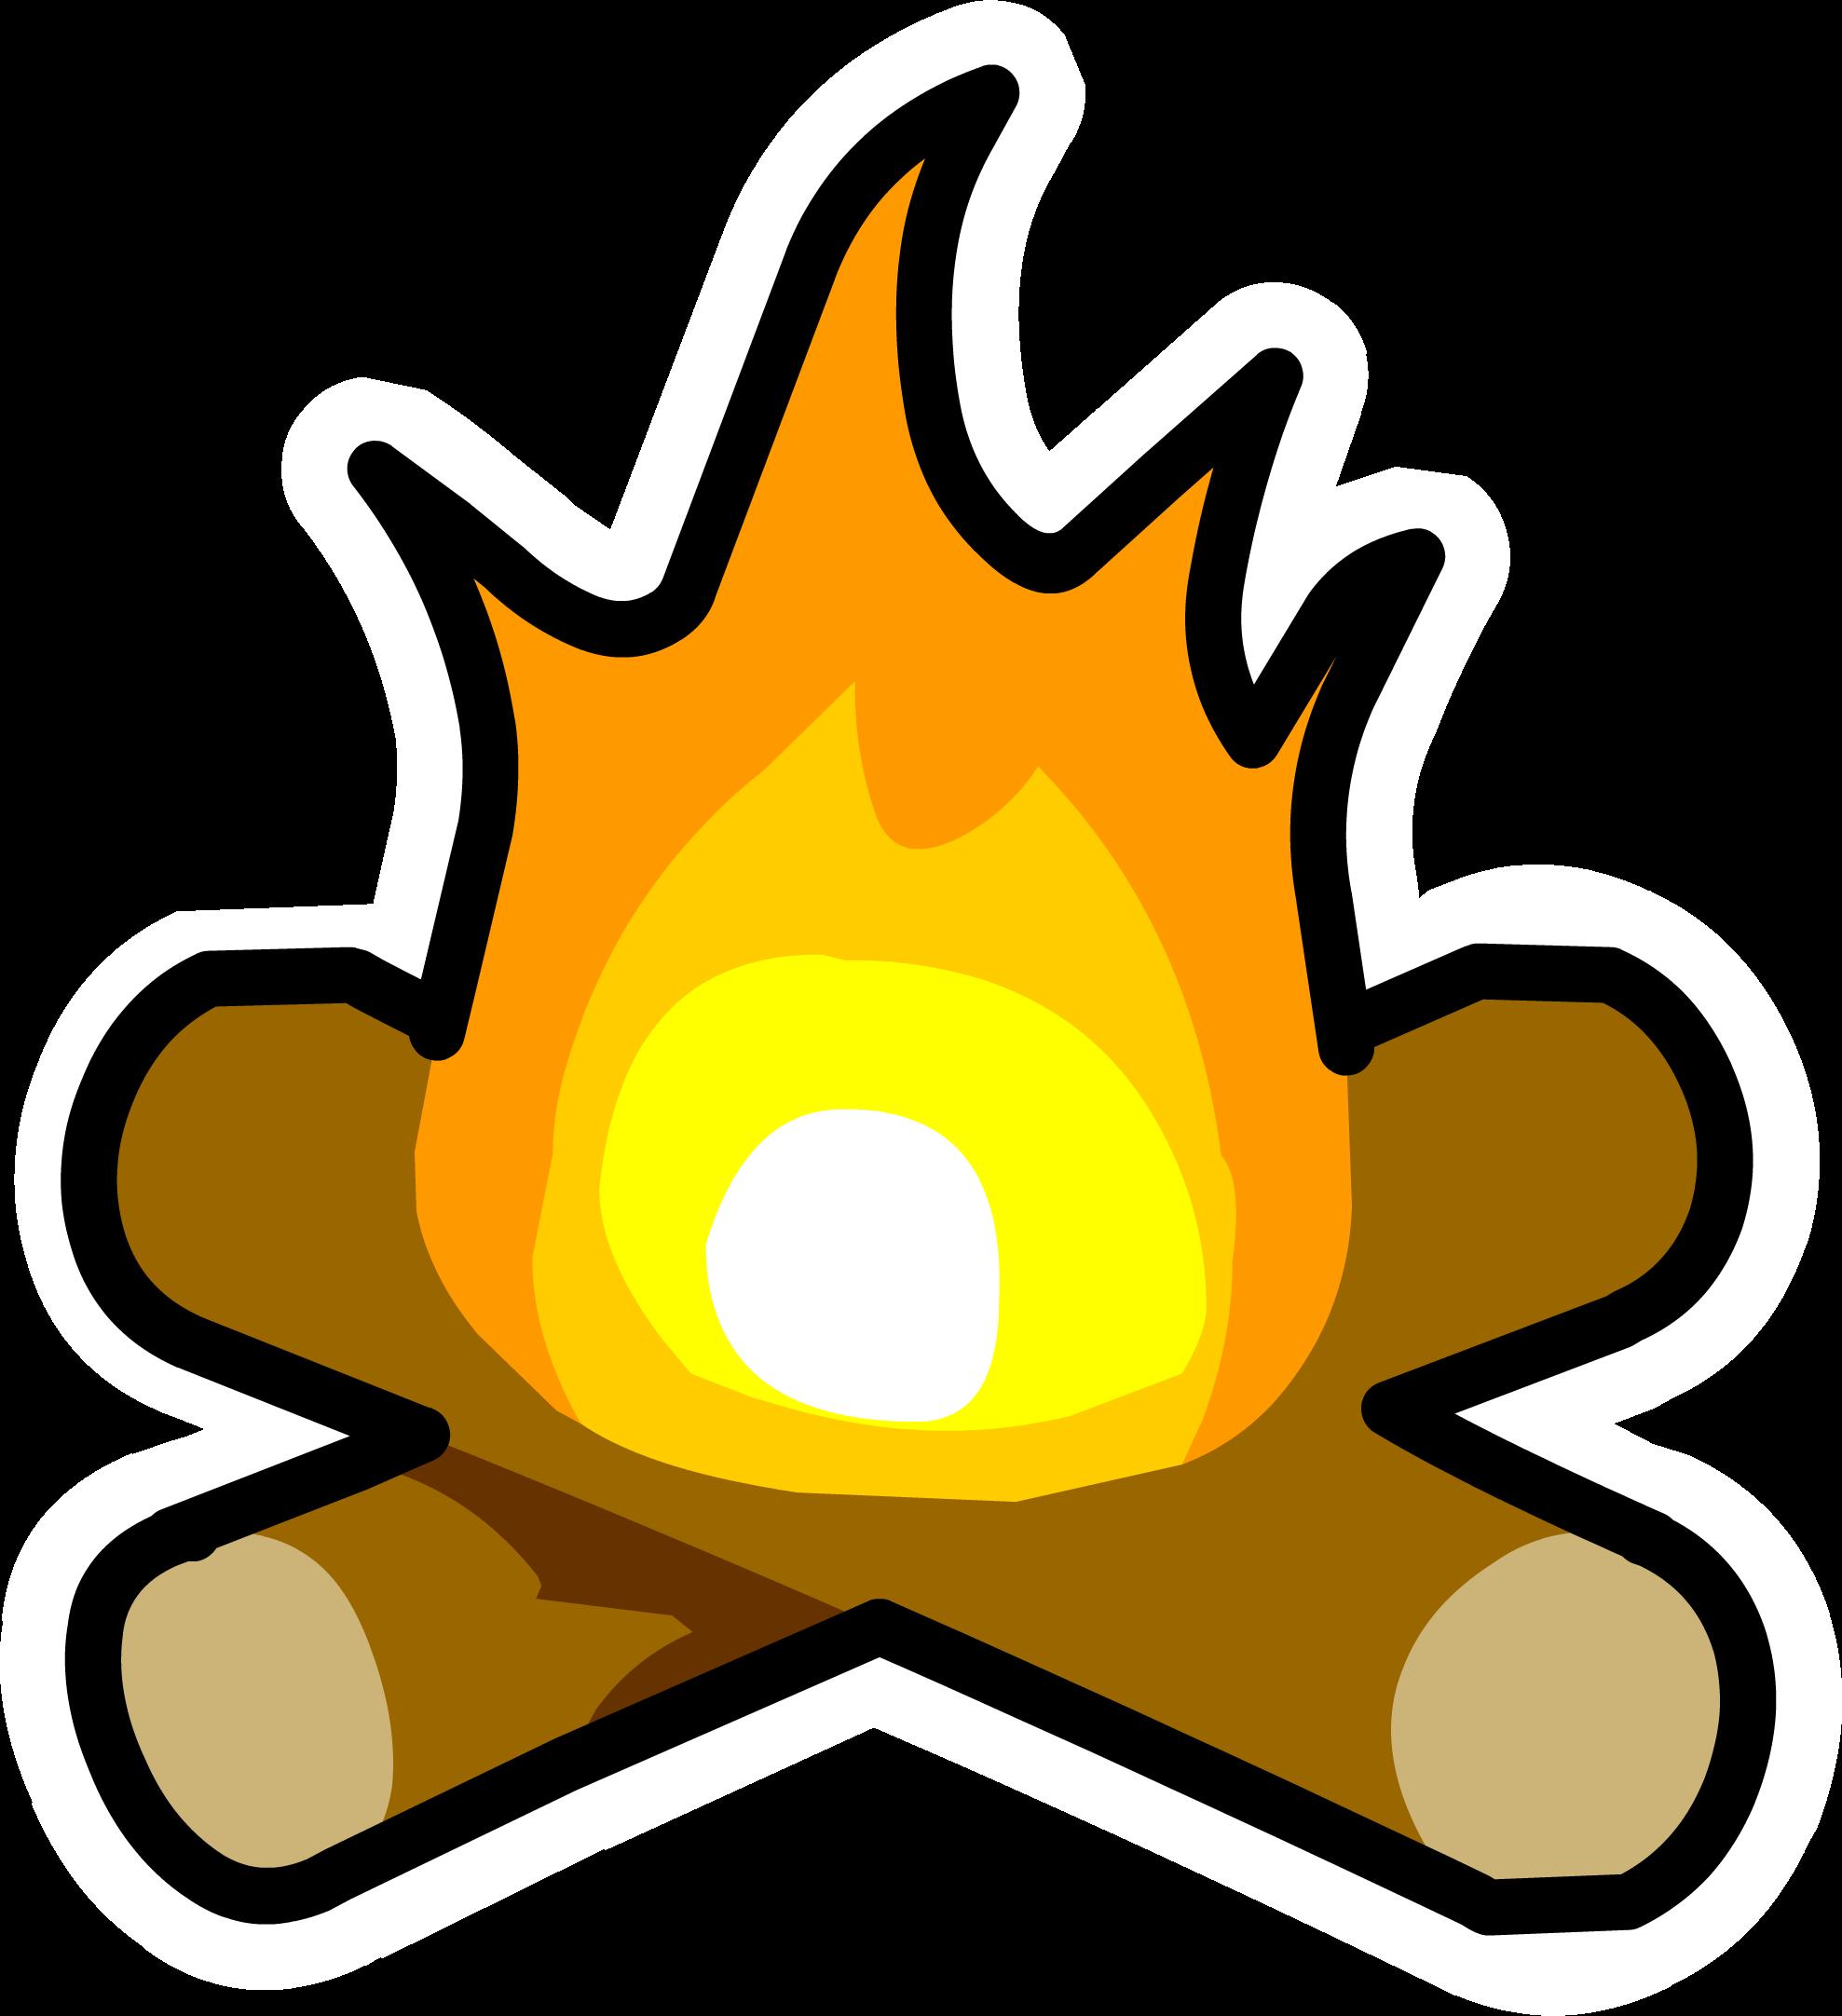 Clipart fire campfire. Bonfire pin club penguin